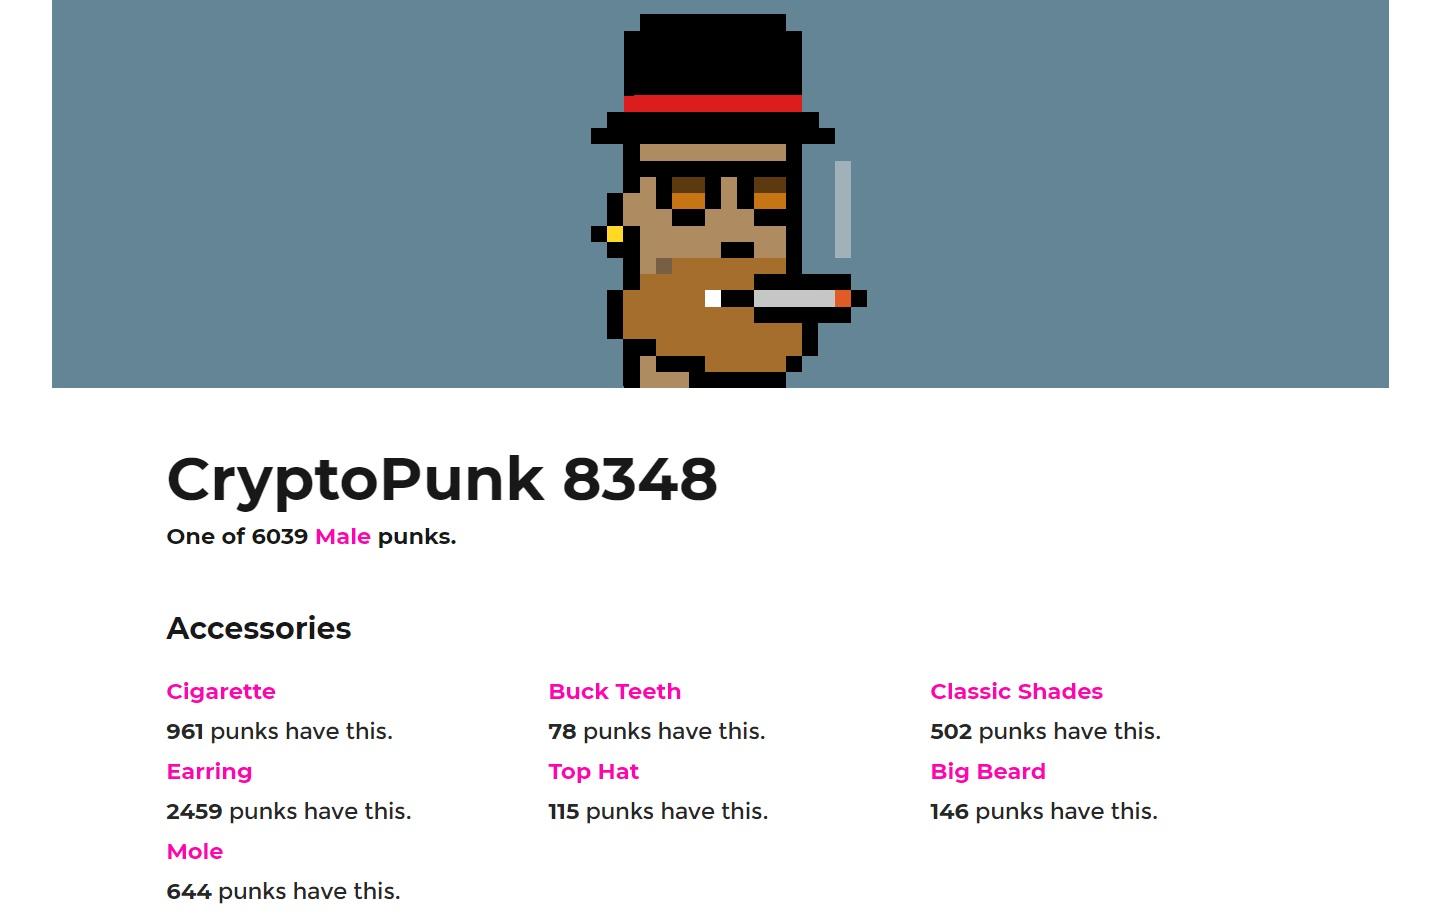 کریپتو پانک cryptopunk